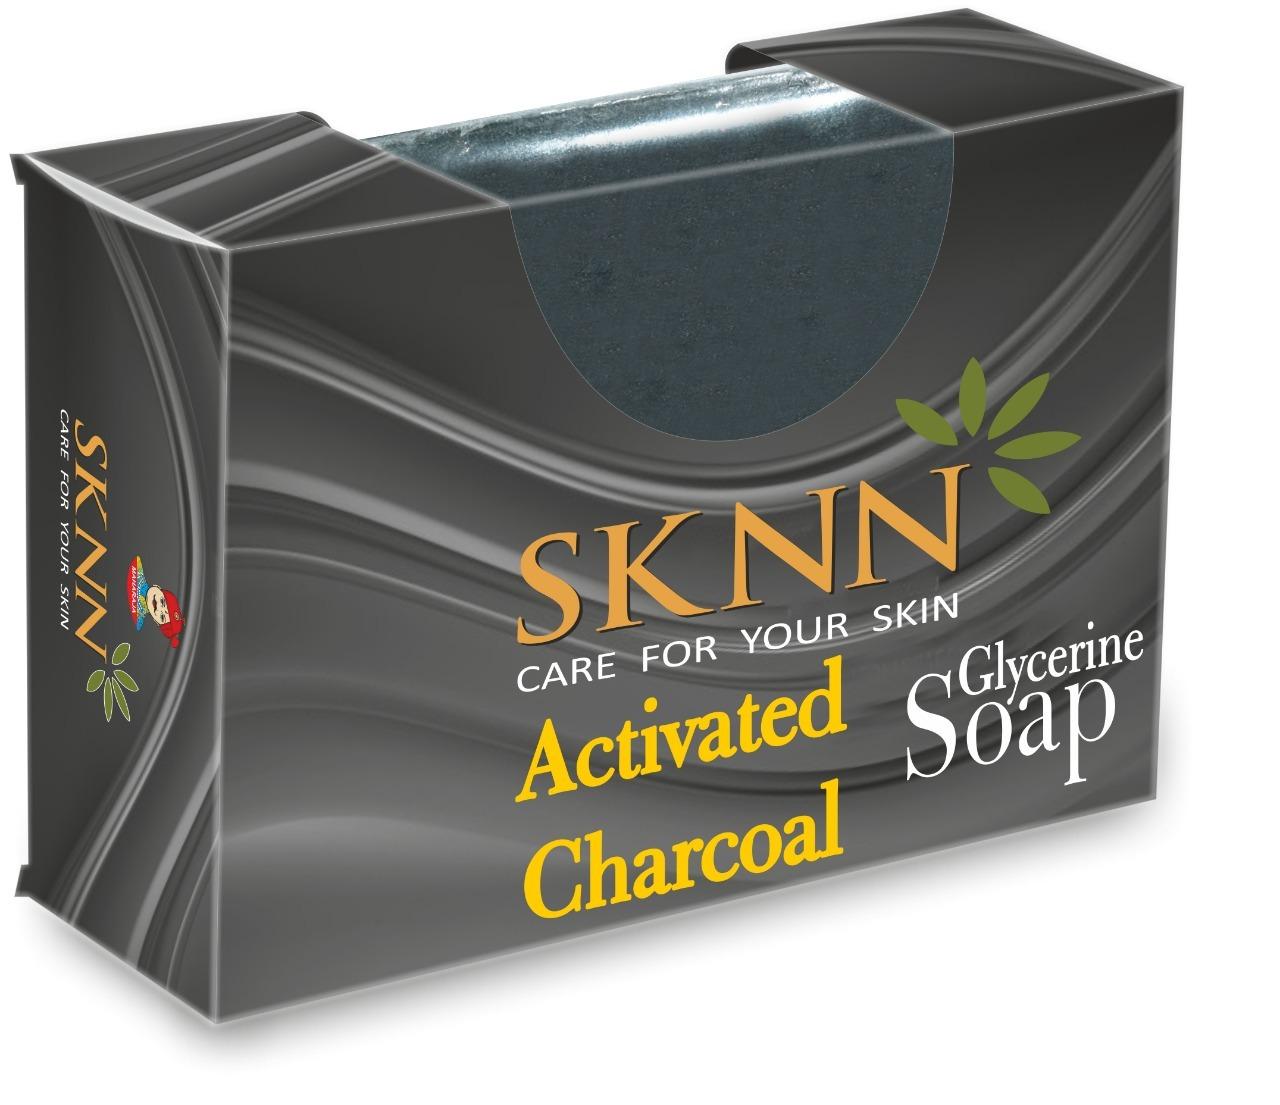 Charcoal Glycerine Soap